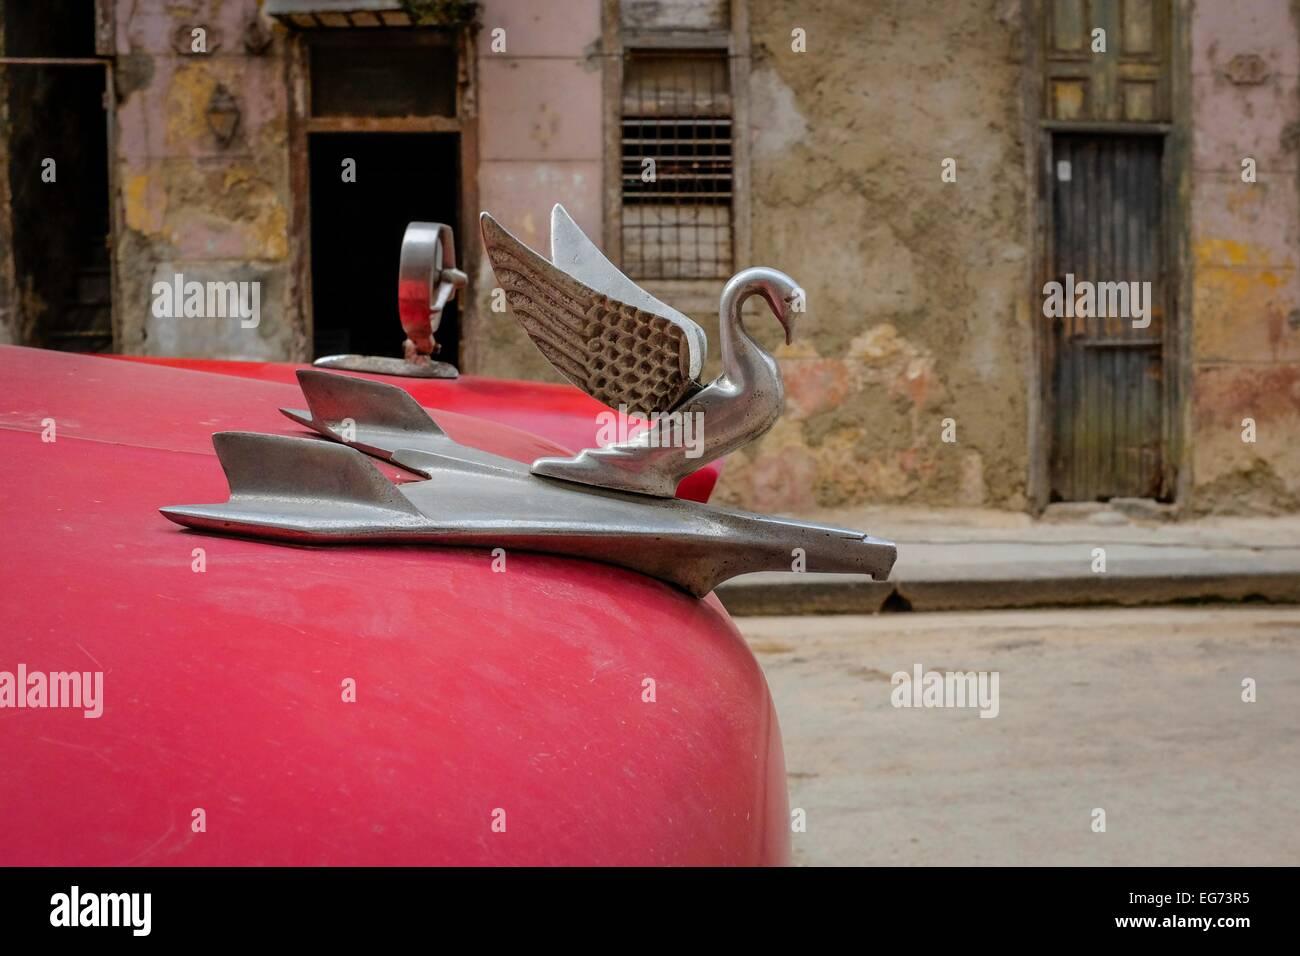 Red Cuban classic car details, Havana, Cuba - Stock Image